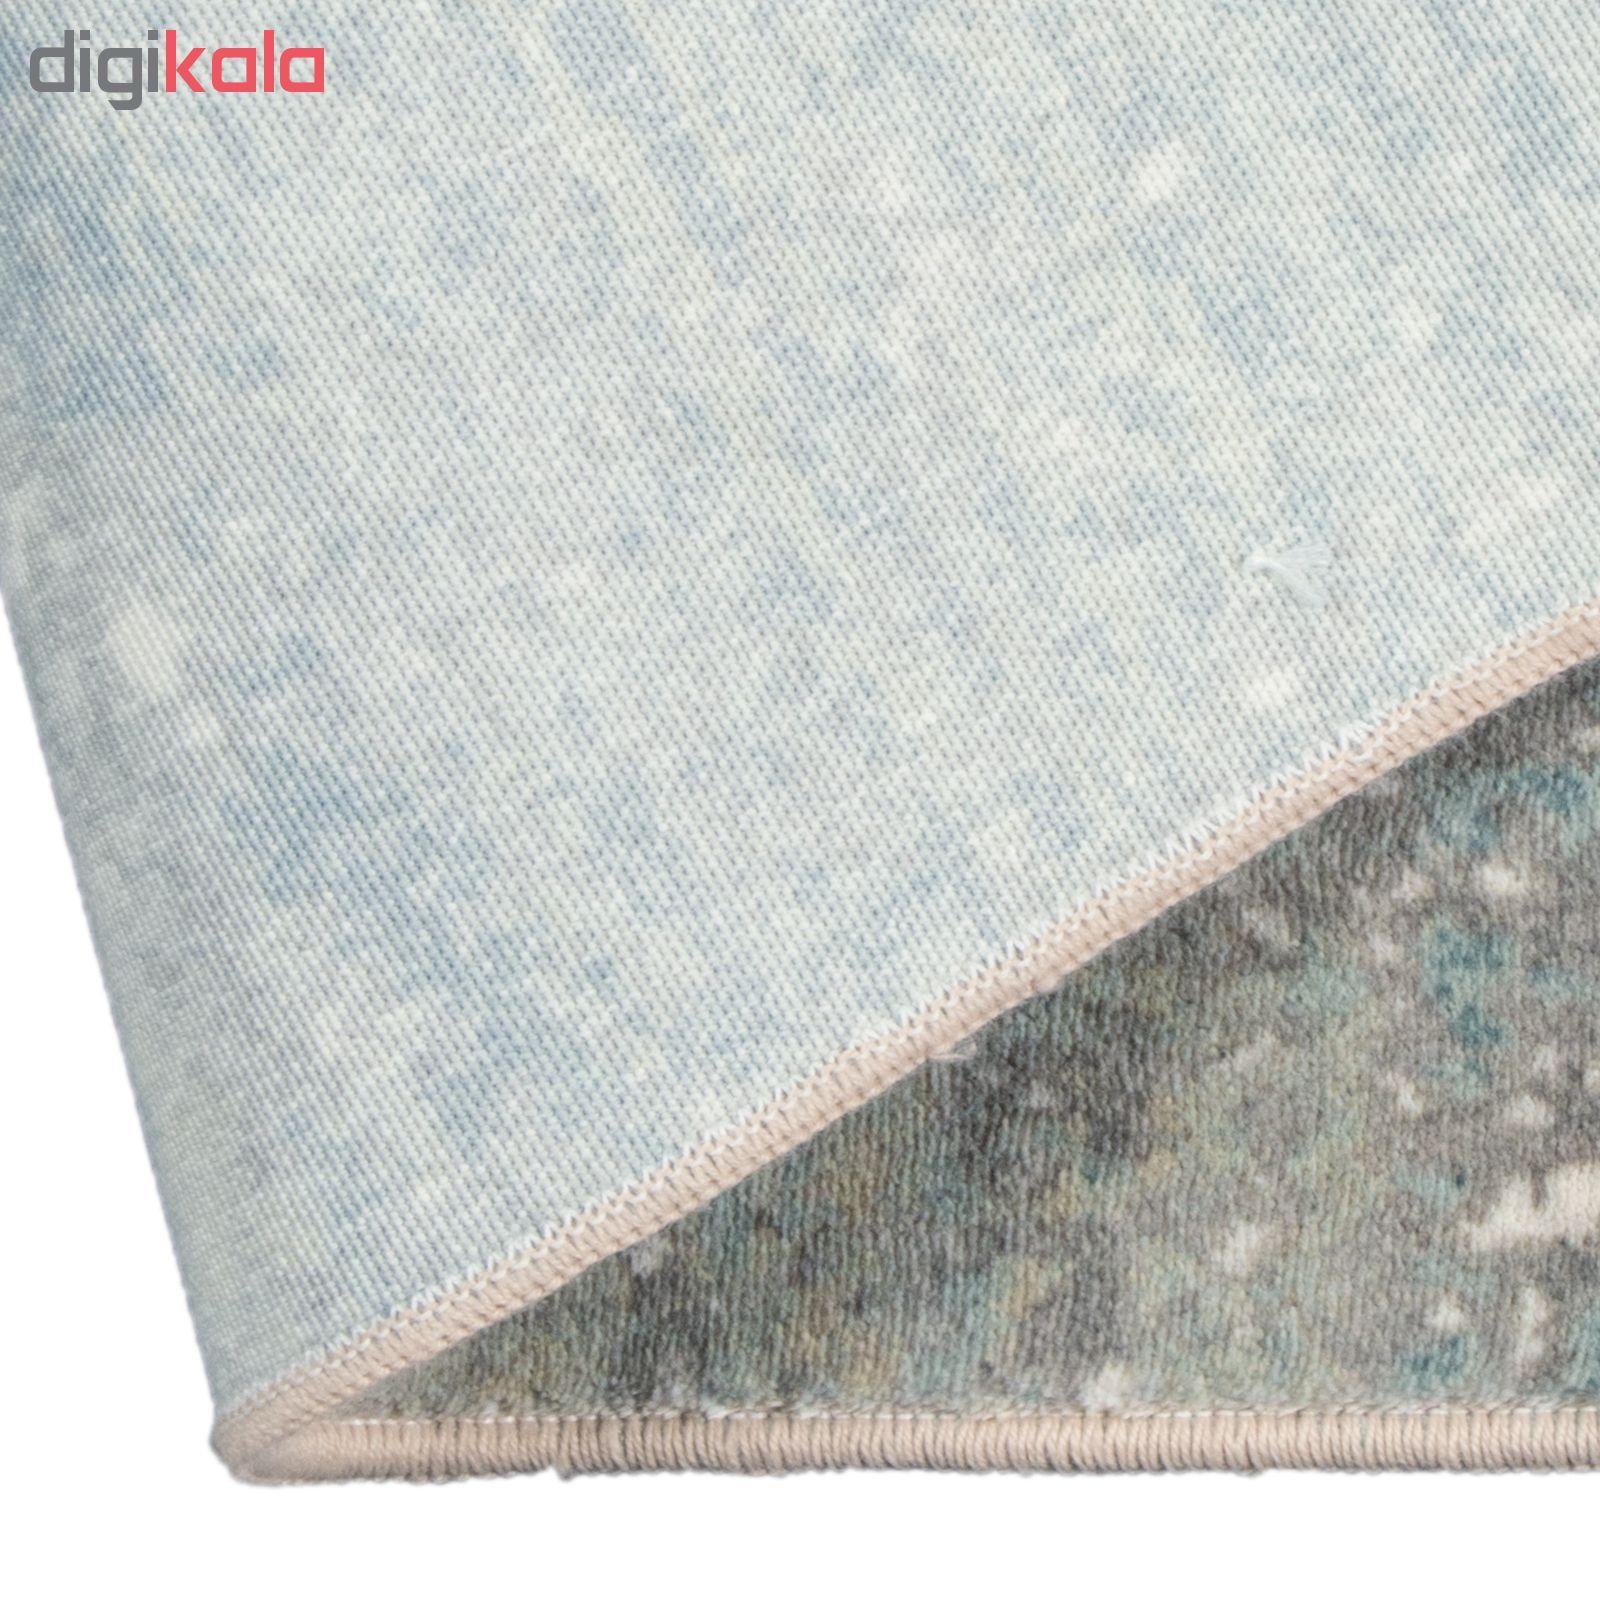 فرش ماشینی محتشم طرح کهنه نما کد 100633 زمینه خاکستری main 1 7